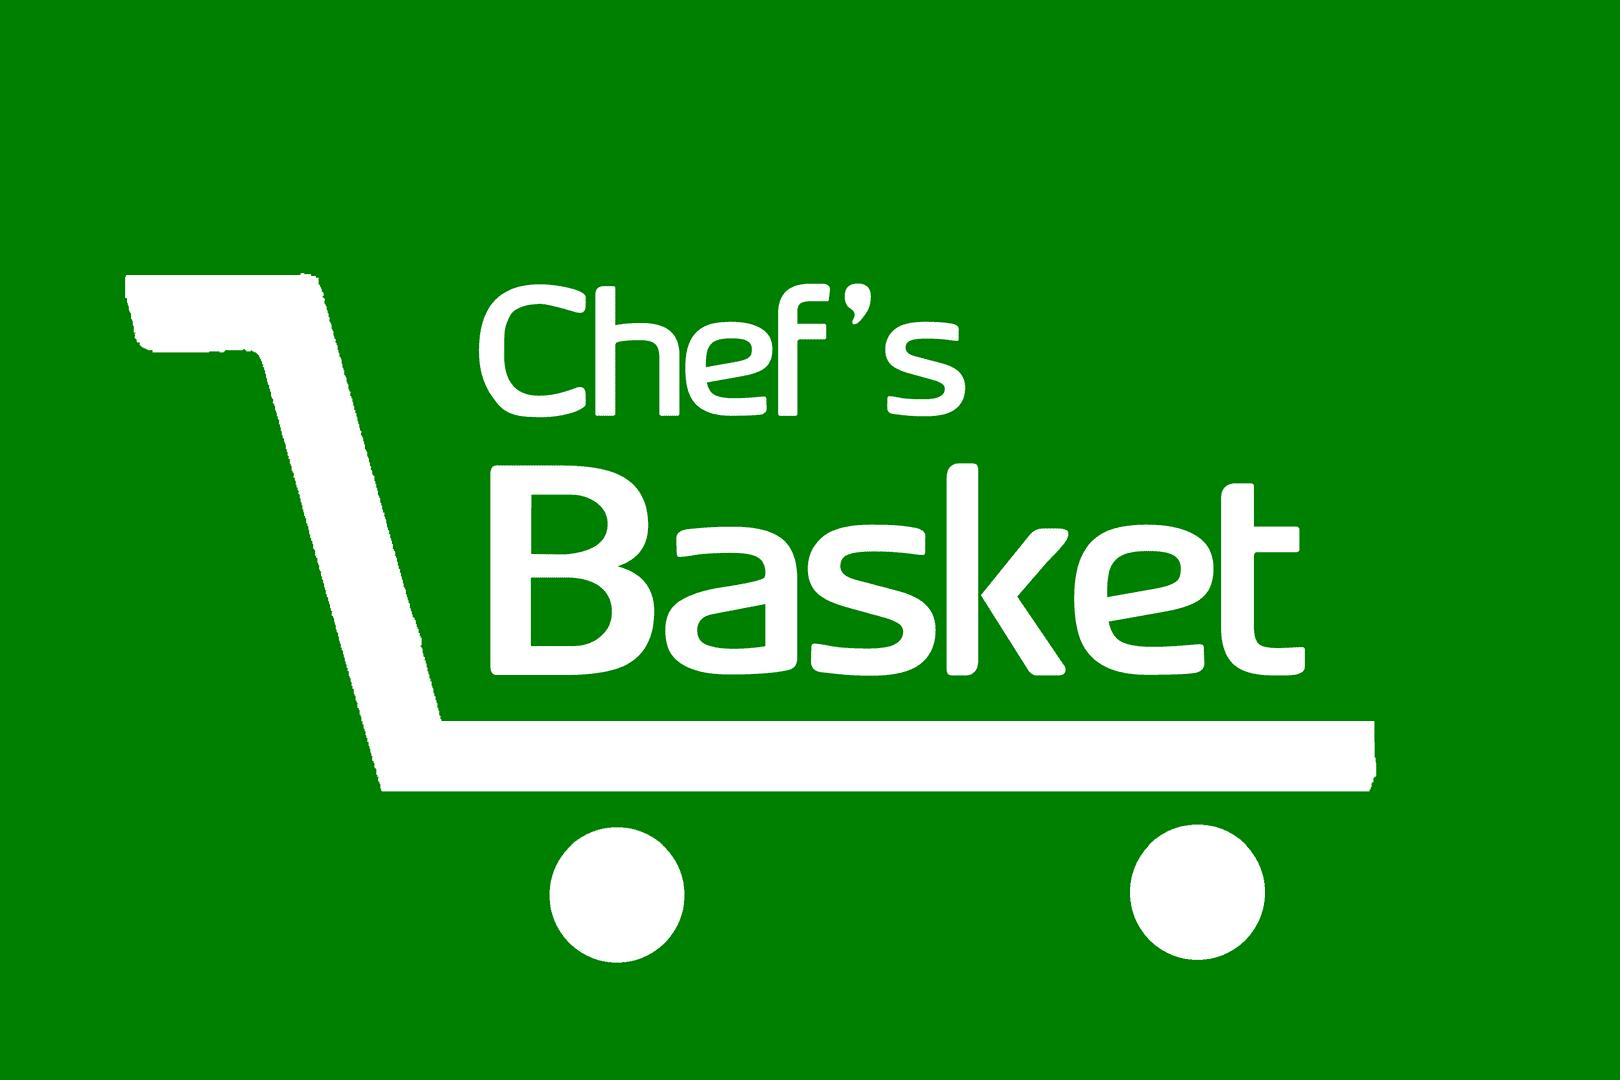 Chefs Basket logo